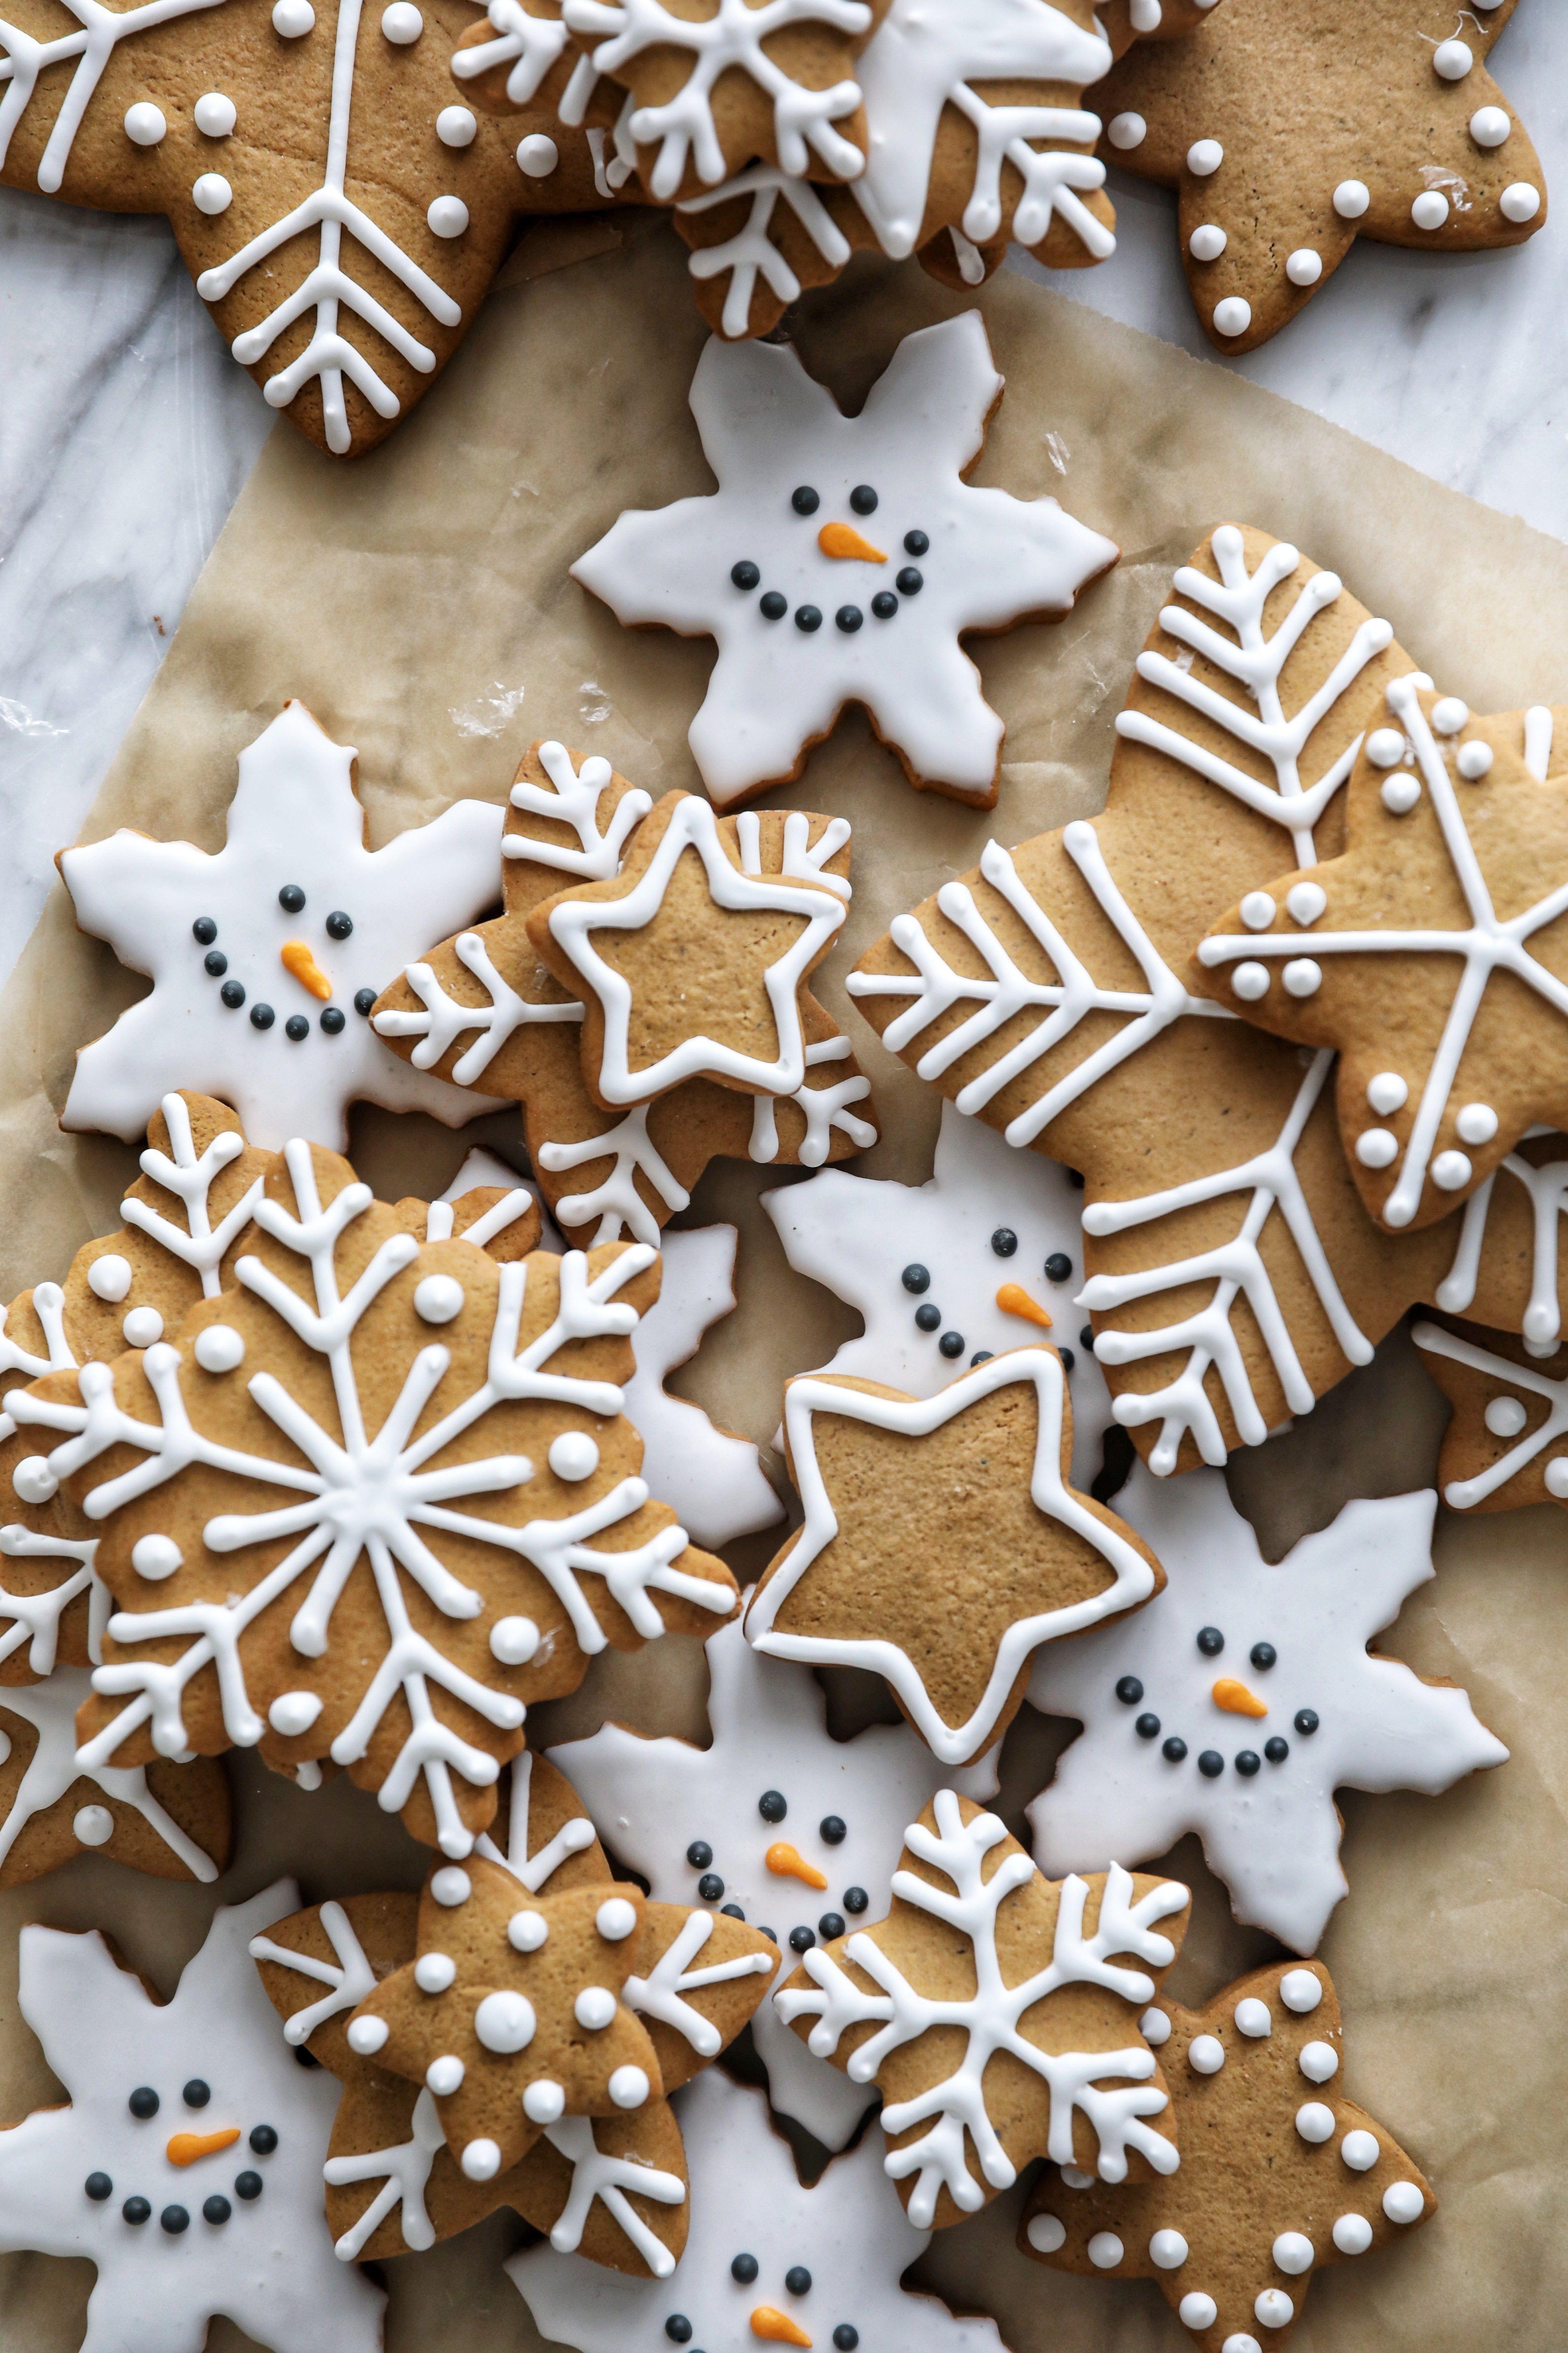 Gingerbread Snowflakes Simply Beautiful Eating Christmas Cookies